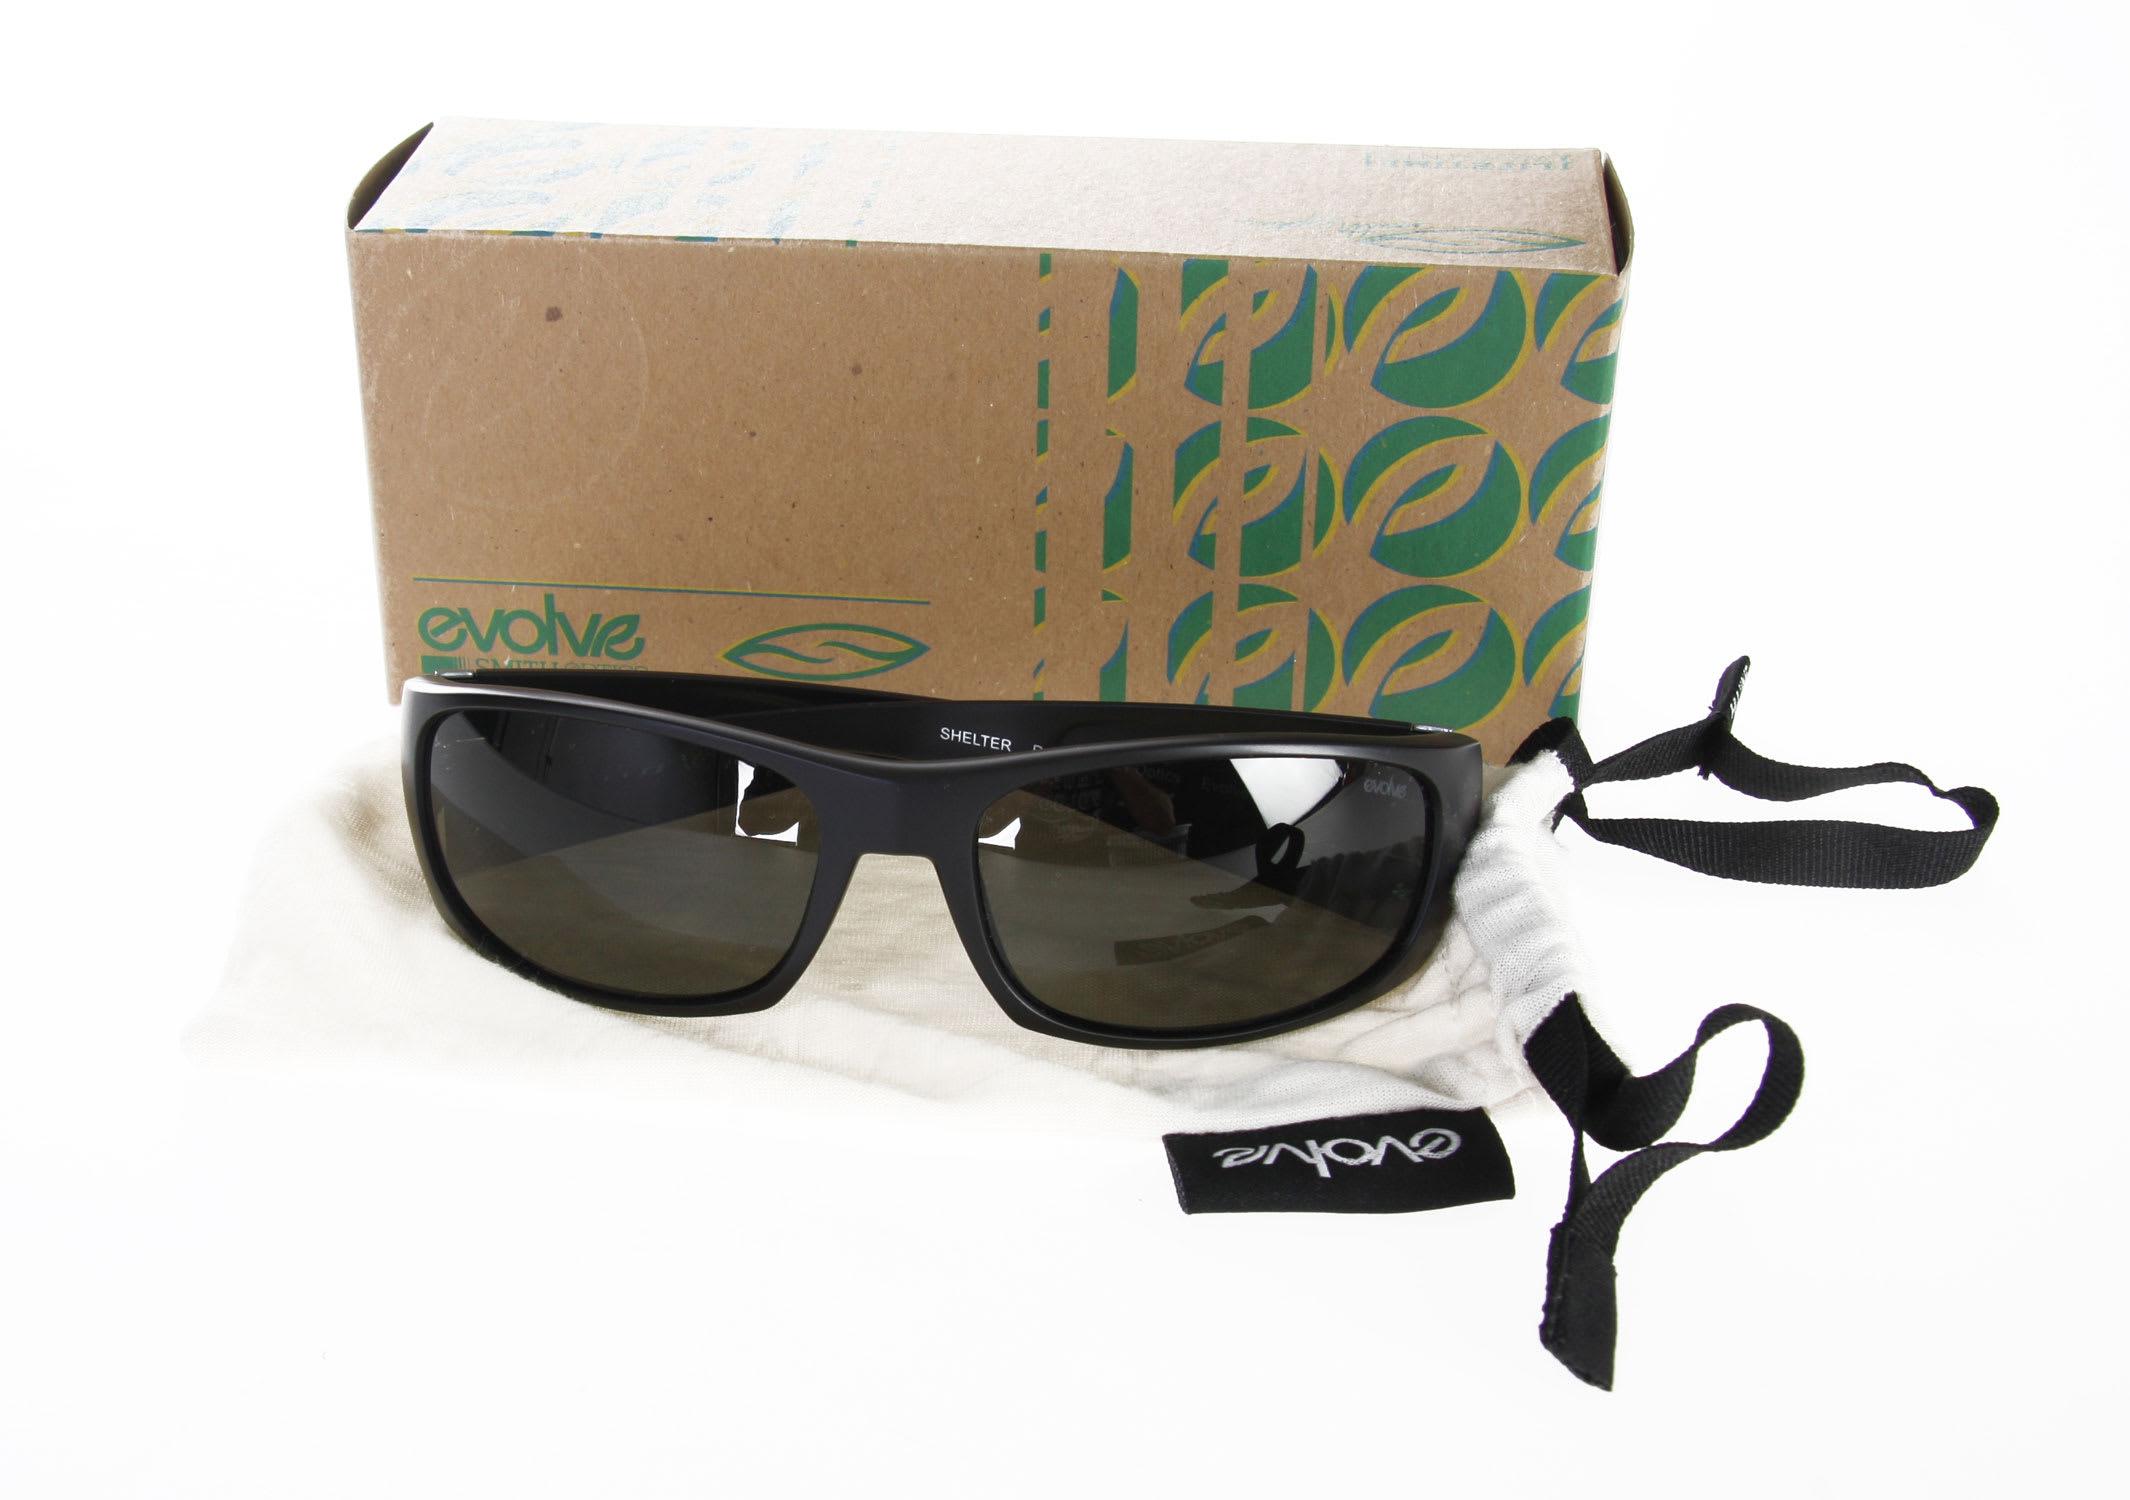 2f6cebab7027b Smith Shelter Sunglasses - thumbnail 4